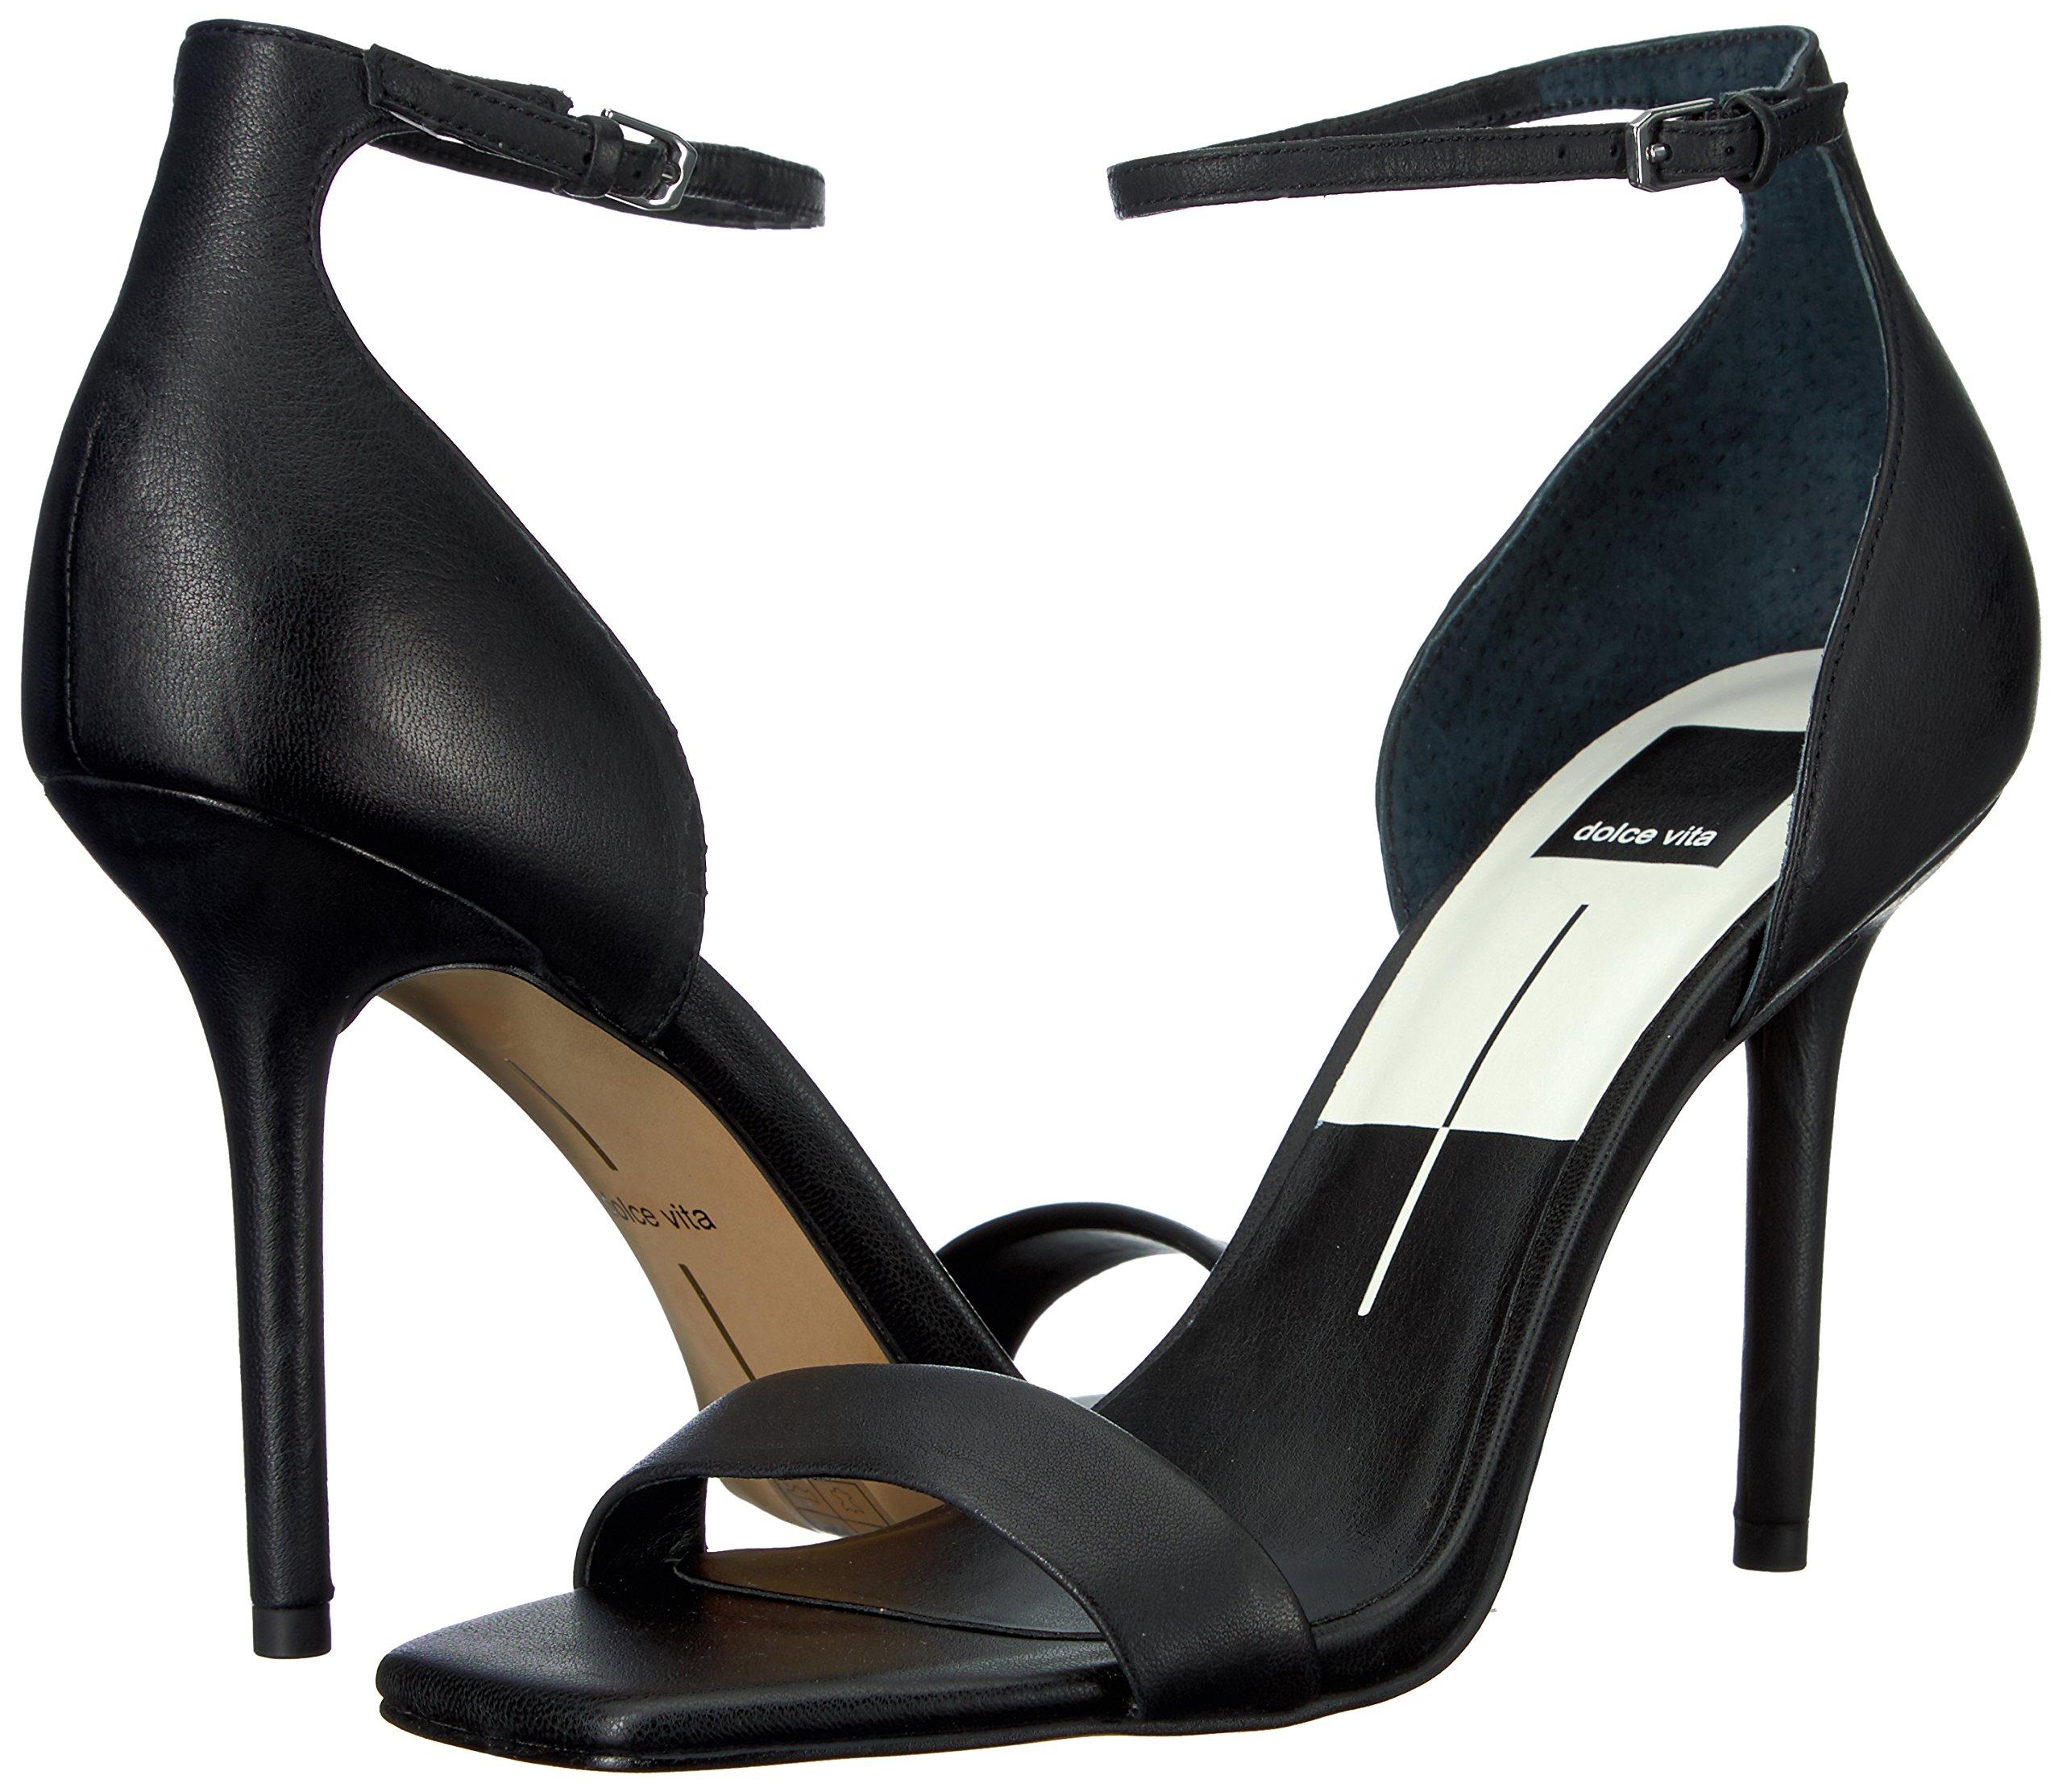 Dolce Vita Women's Halo Heeled Sandal, Black Leather, 8.5 Medium US by Dolce Vita (Image #6)